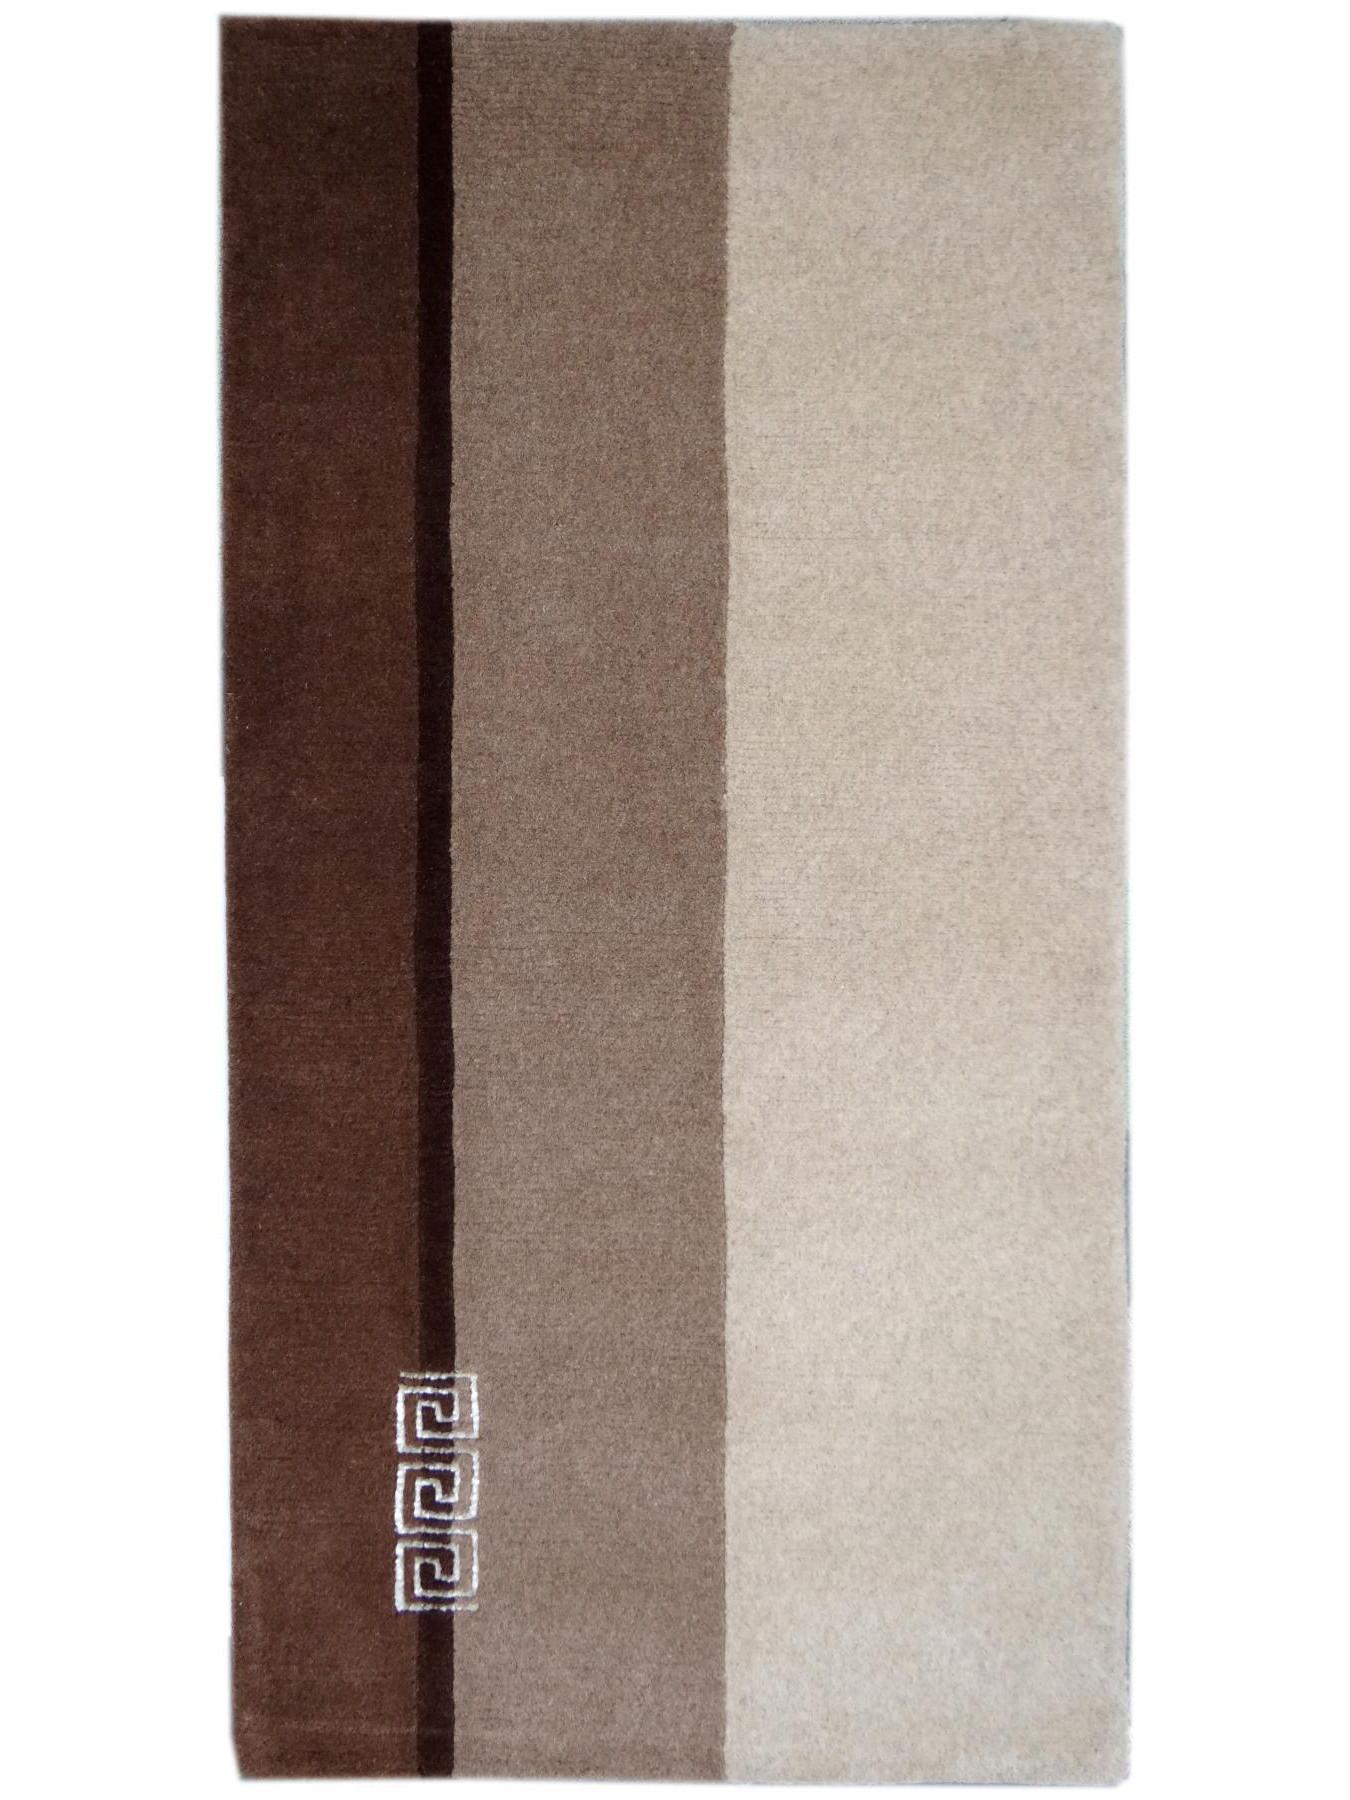 Design carpets - CHARISMA 3 - 6660